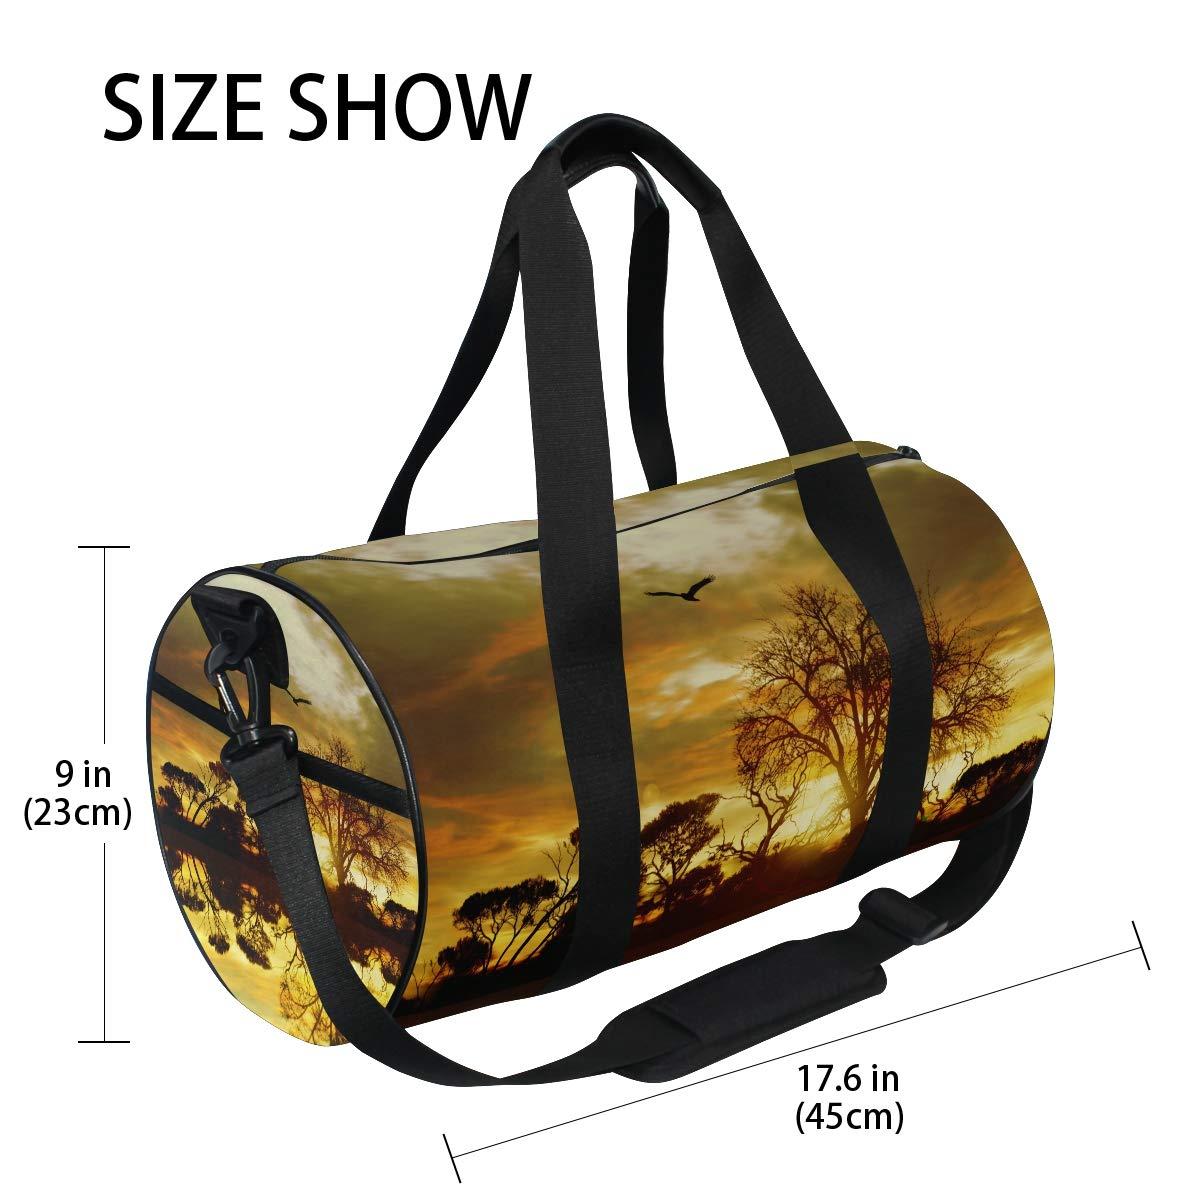 WIHVE Gym Duffel Bag Beautiful Landscape Forest Sunset Birds Sports Lightweight Canvas Travel Luggage Bag